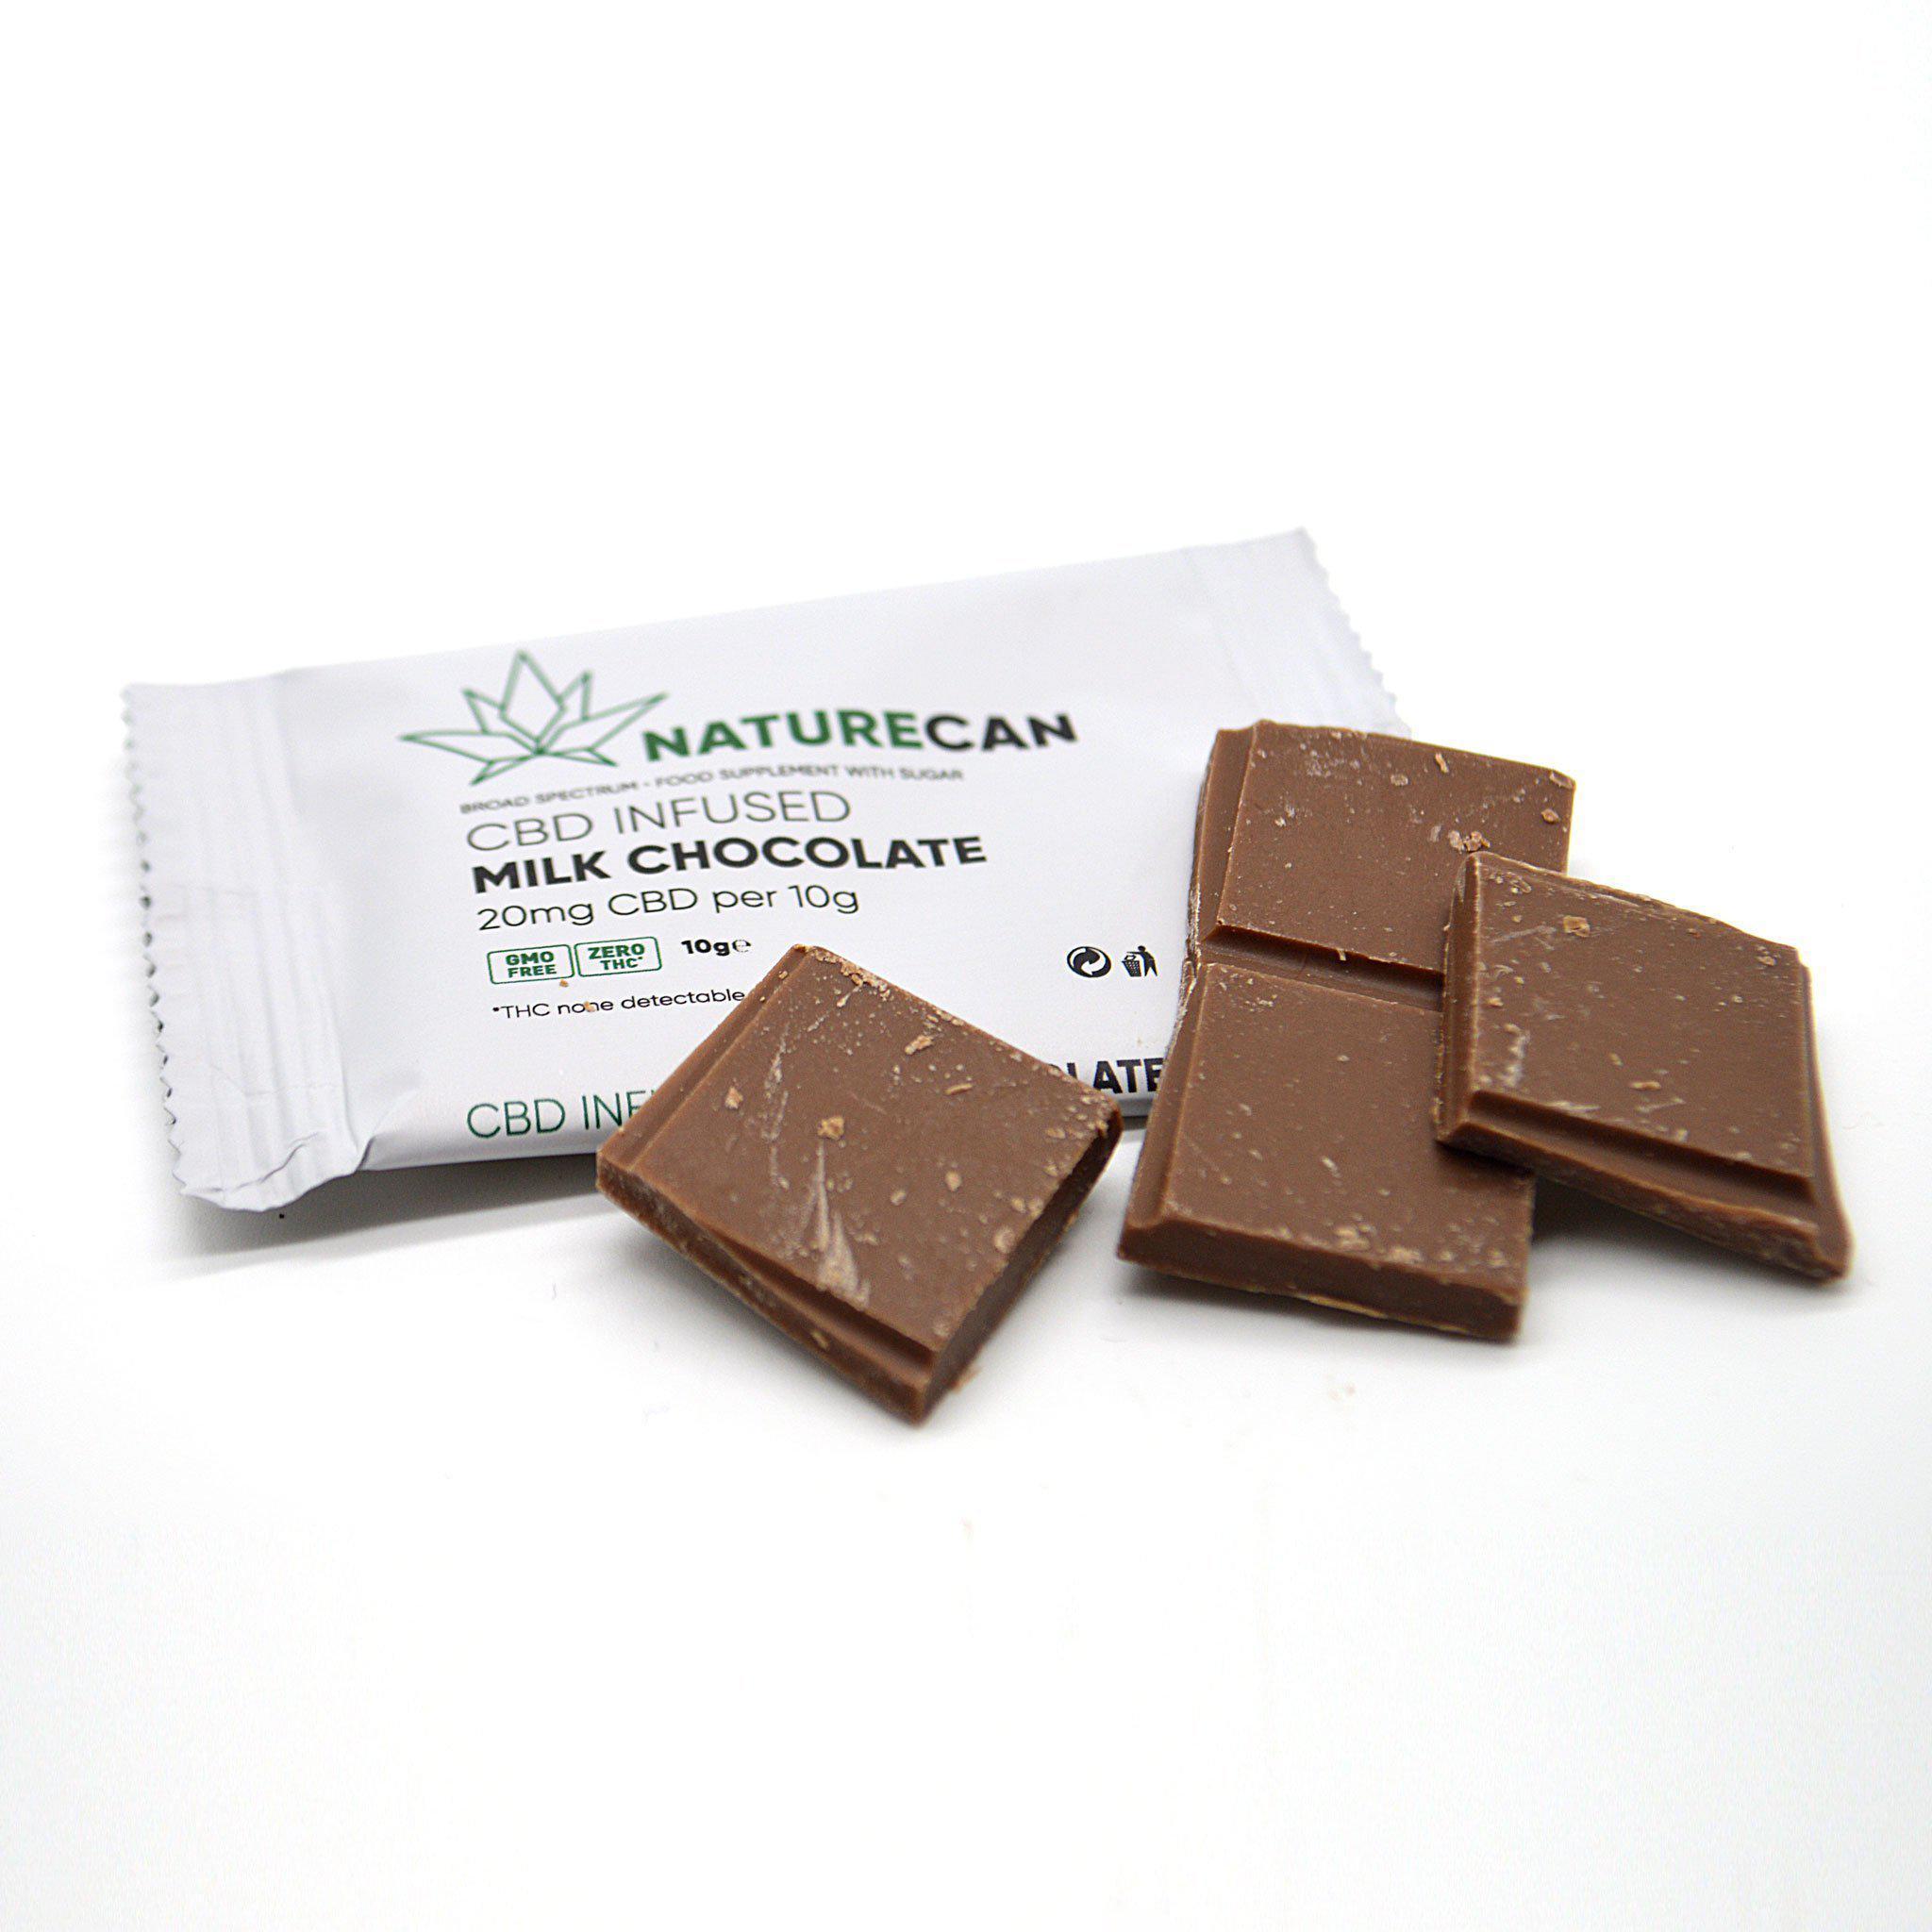 Schokolade Milchschokolade - Naturecan